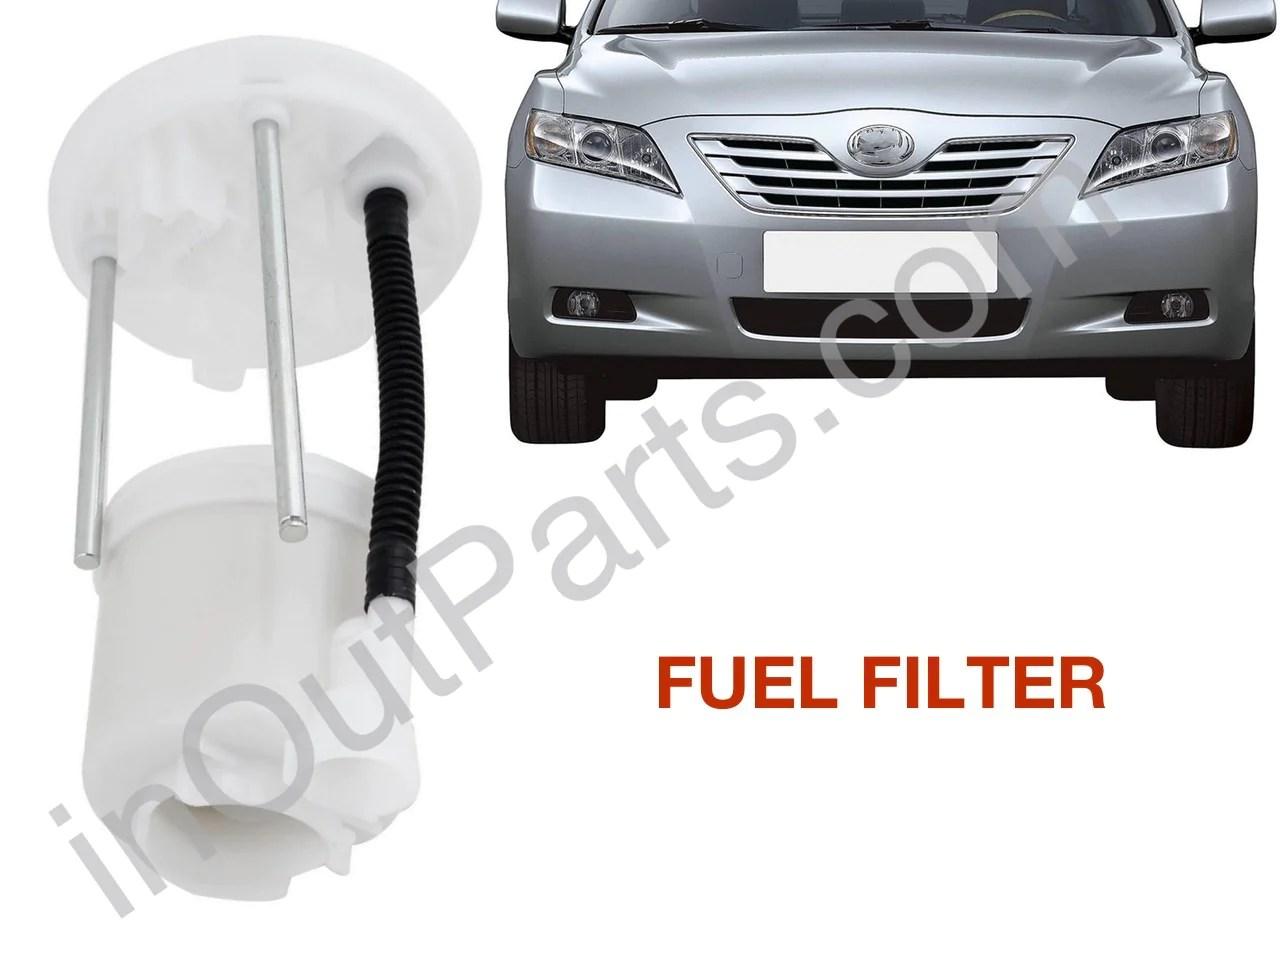 fuel filter toyota camry 2azfe 2006 2007 2008 2009 2010 2011 2012 1990 toyota pickup fuel [ 1280 x 960 Pixel ]